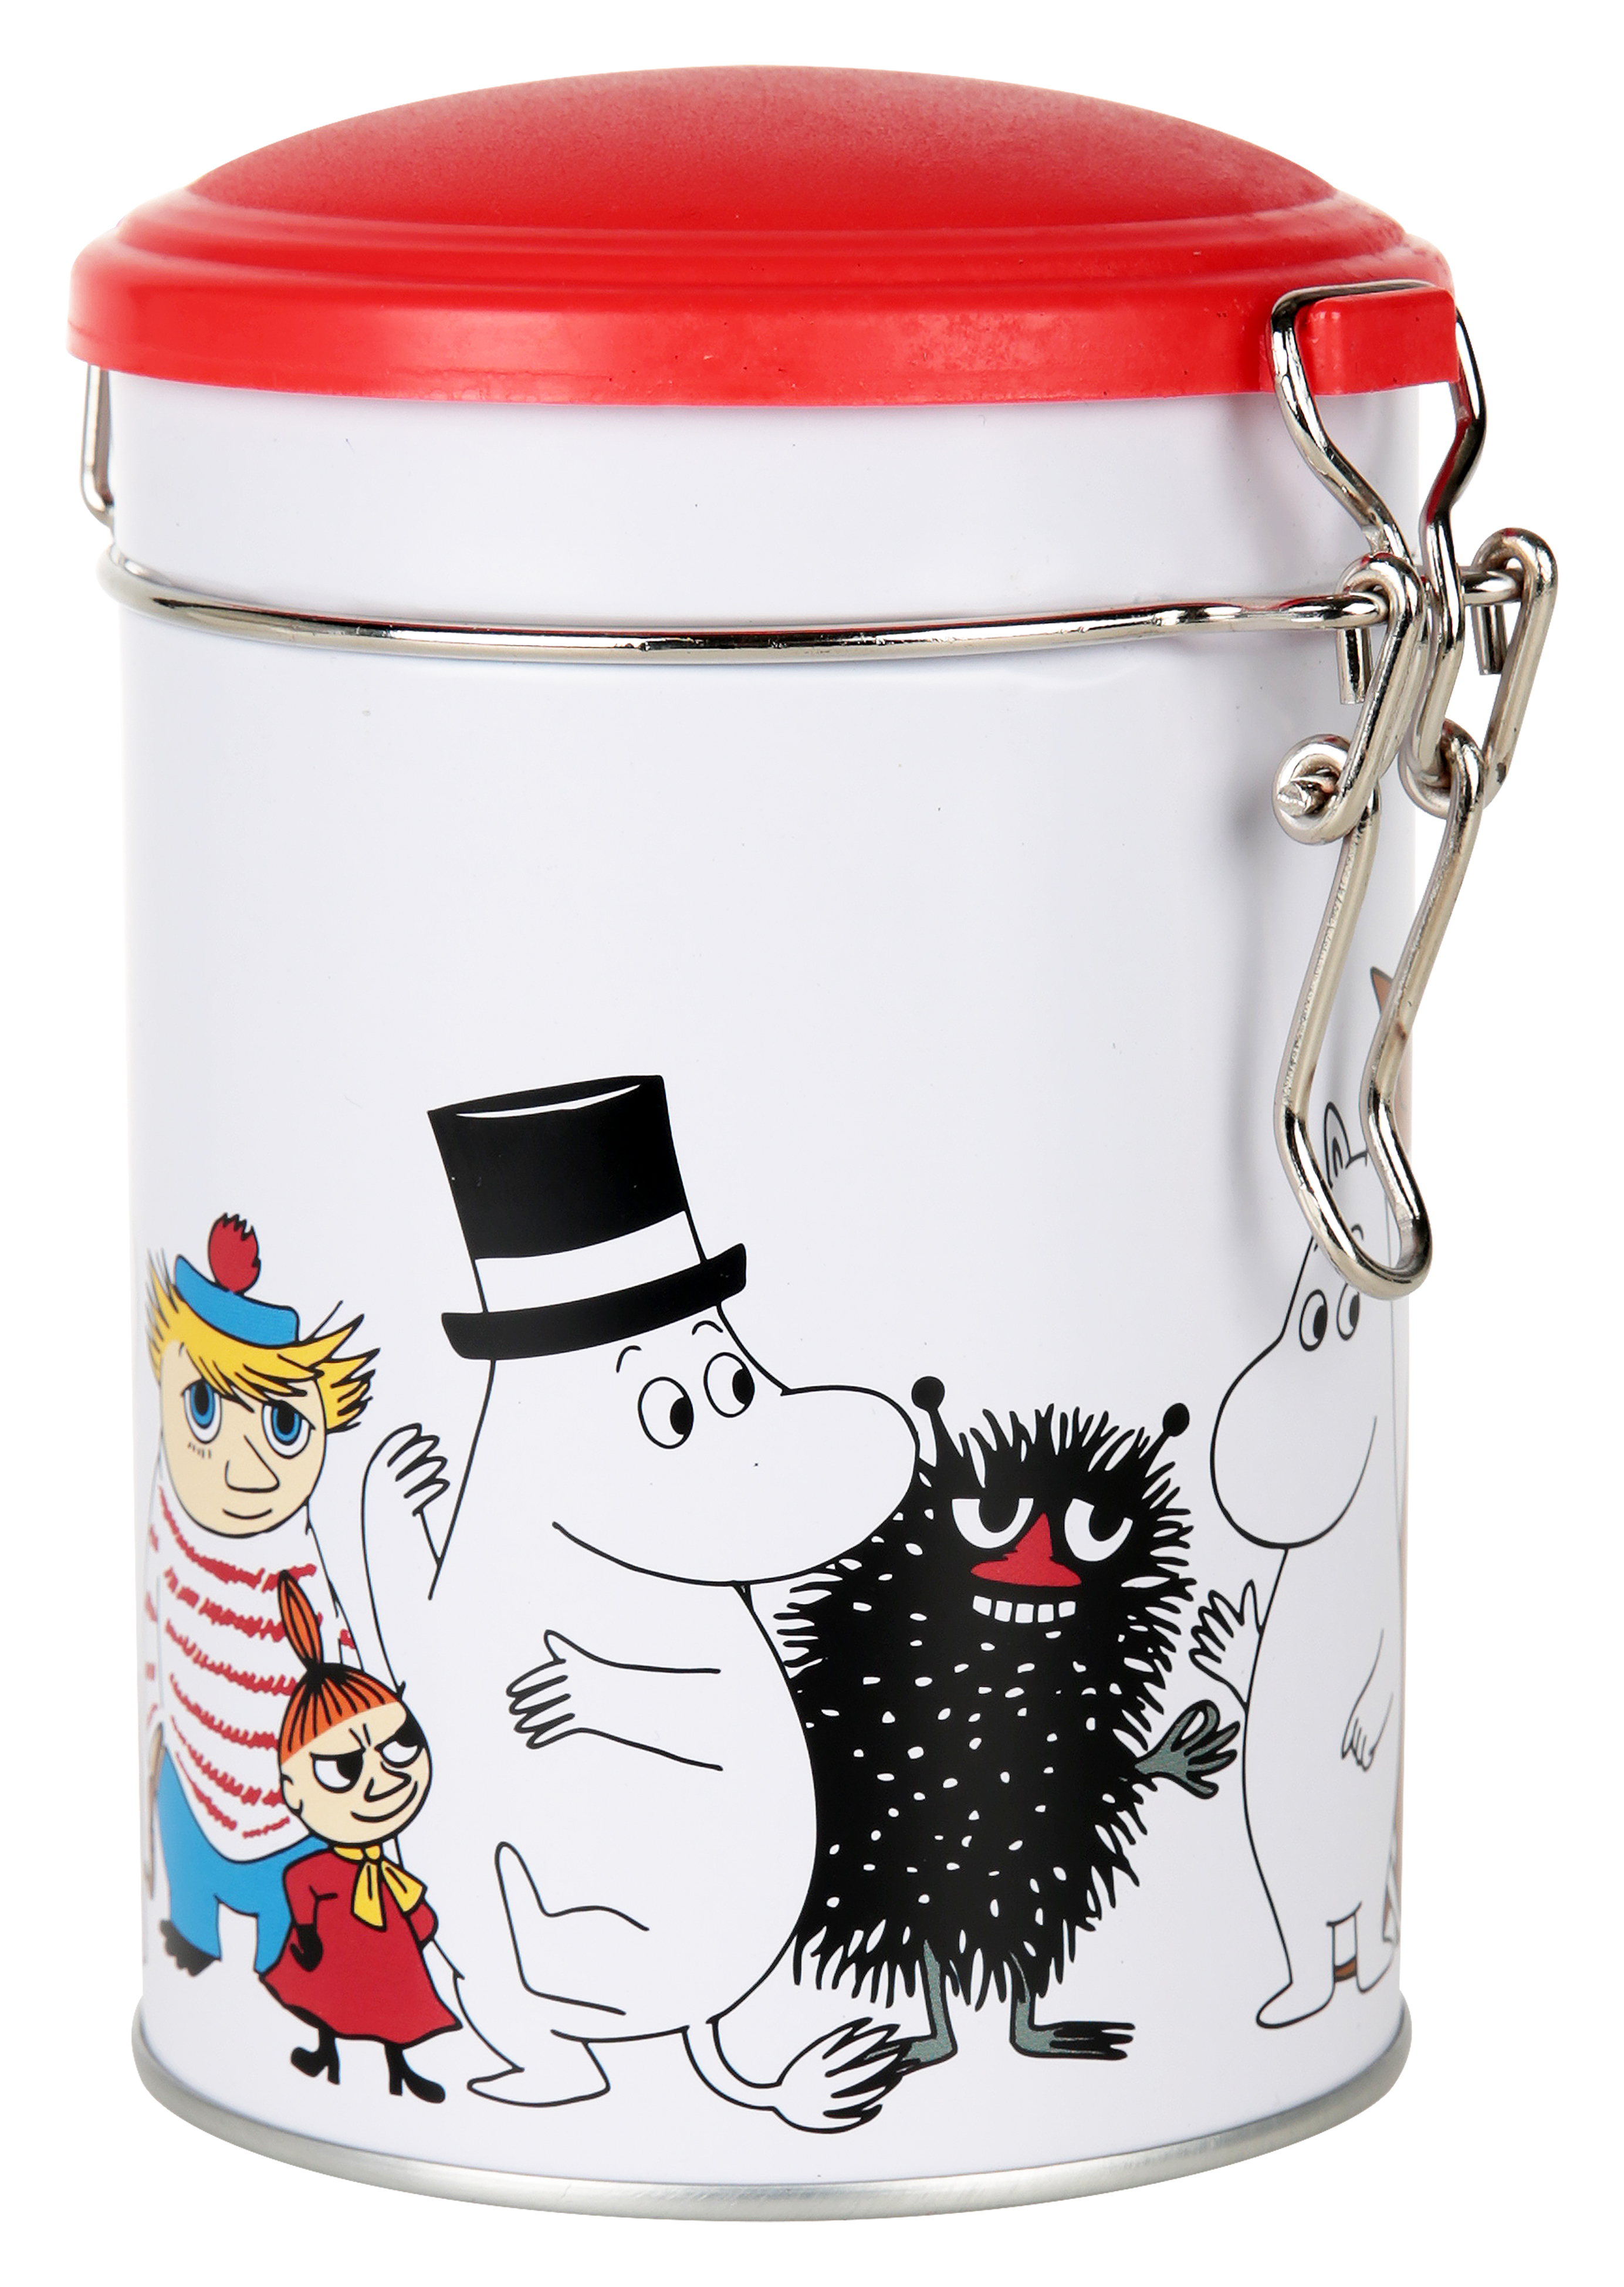 Martinex Moomin Characters Round Tea Tin